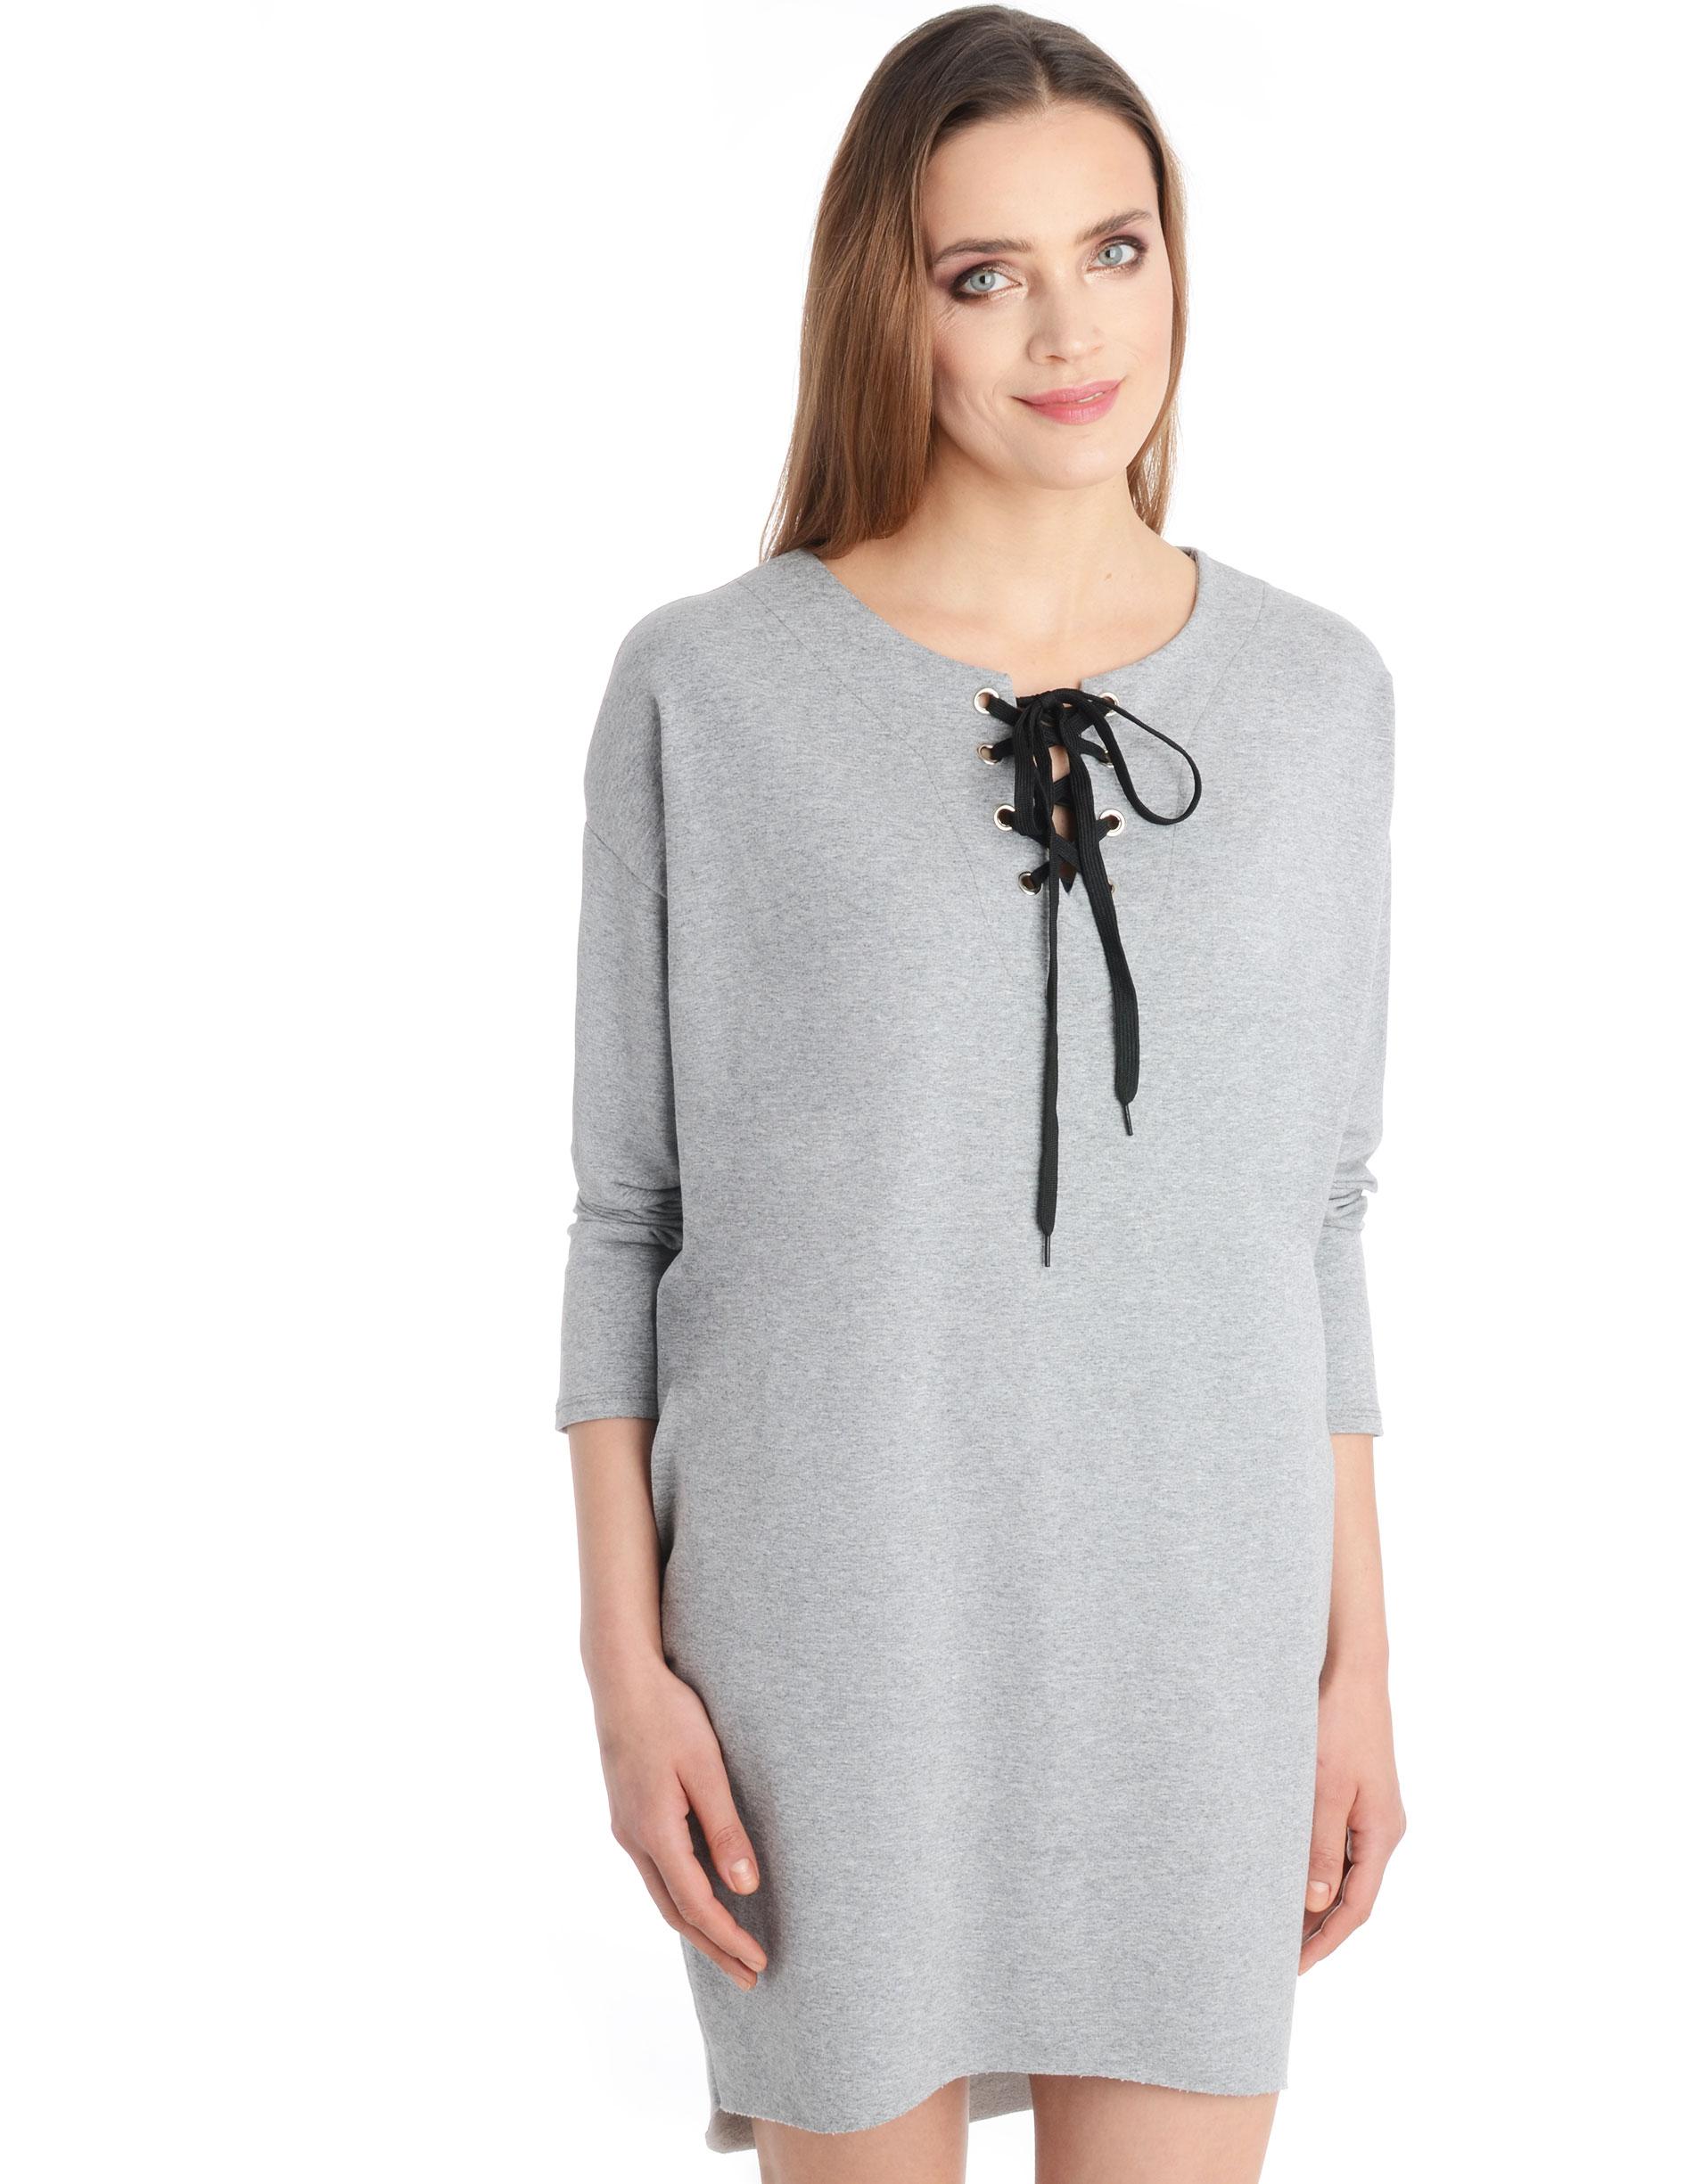 Sukienka - 109-6288 GRCH - Unisono